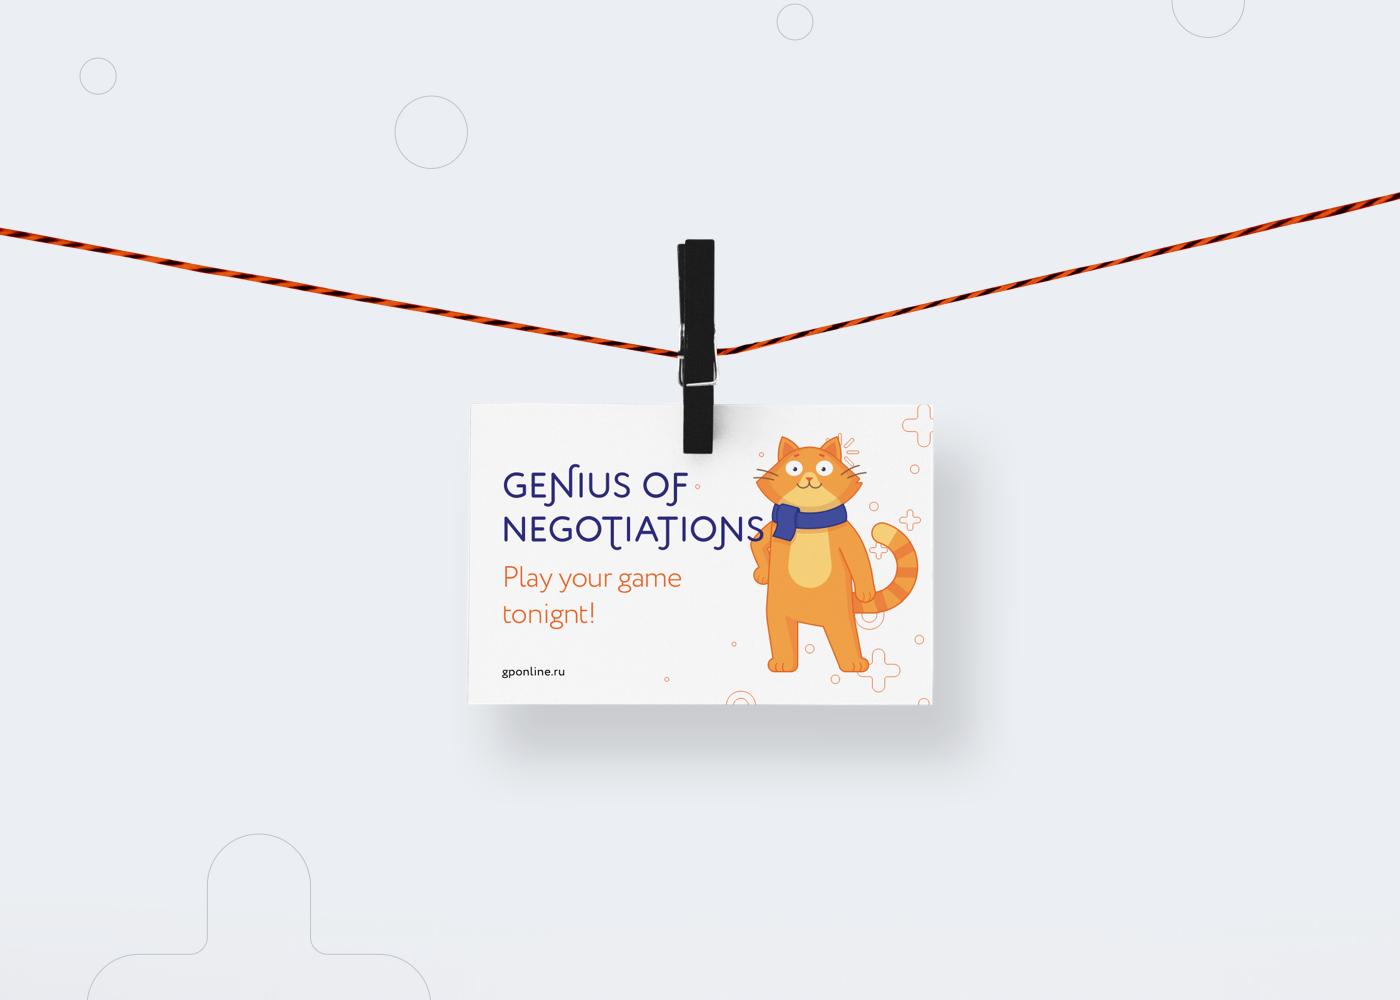 online game business crowdfunding Mascot logo brand genius Negotiations